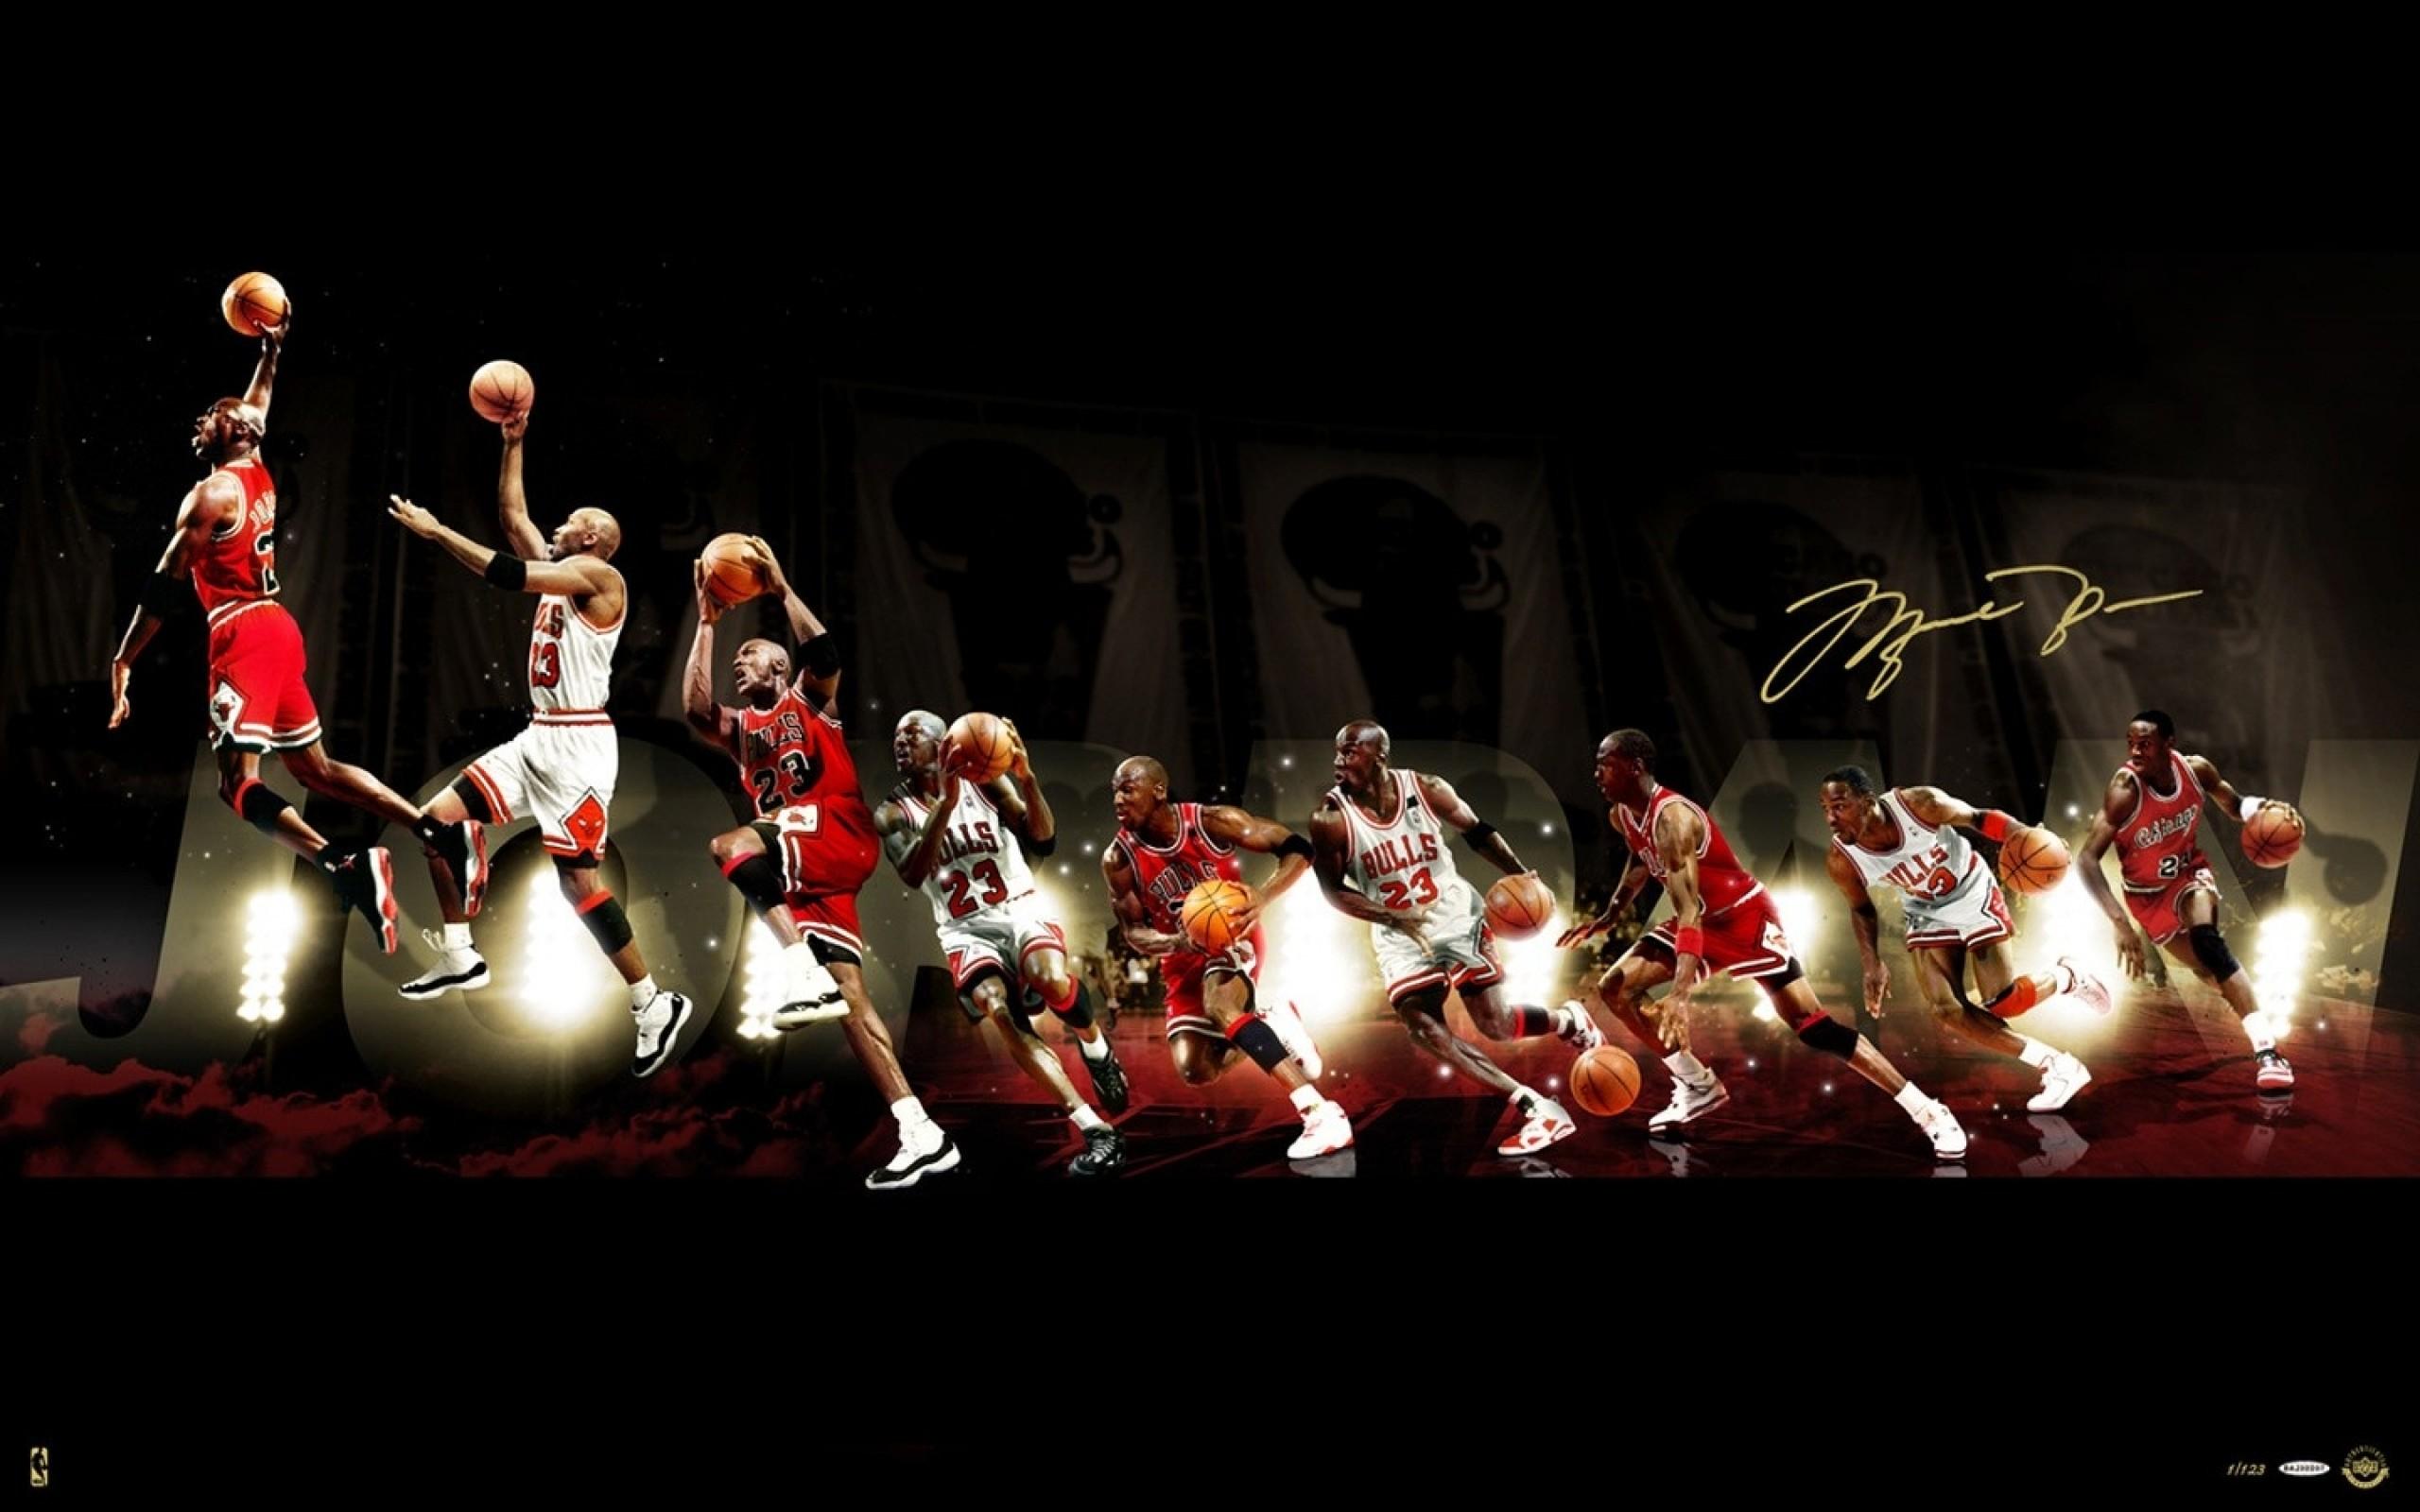 Michael-Jordan-Chicago-Bulls-Wallpaper-HD